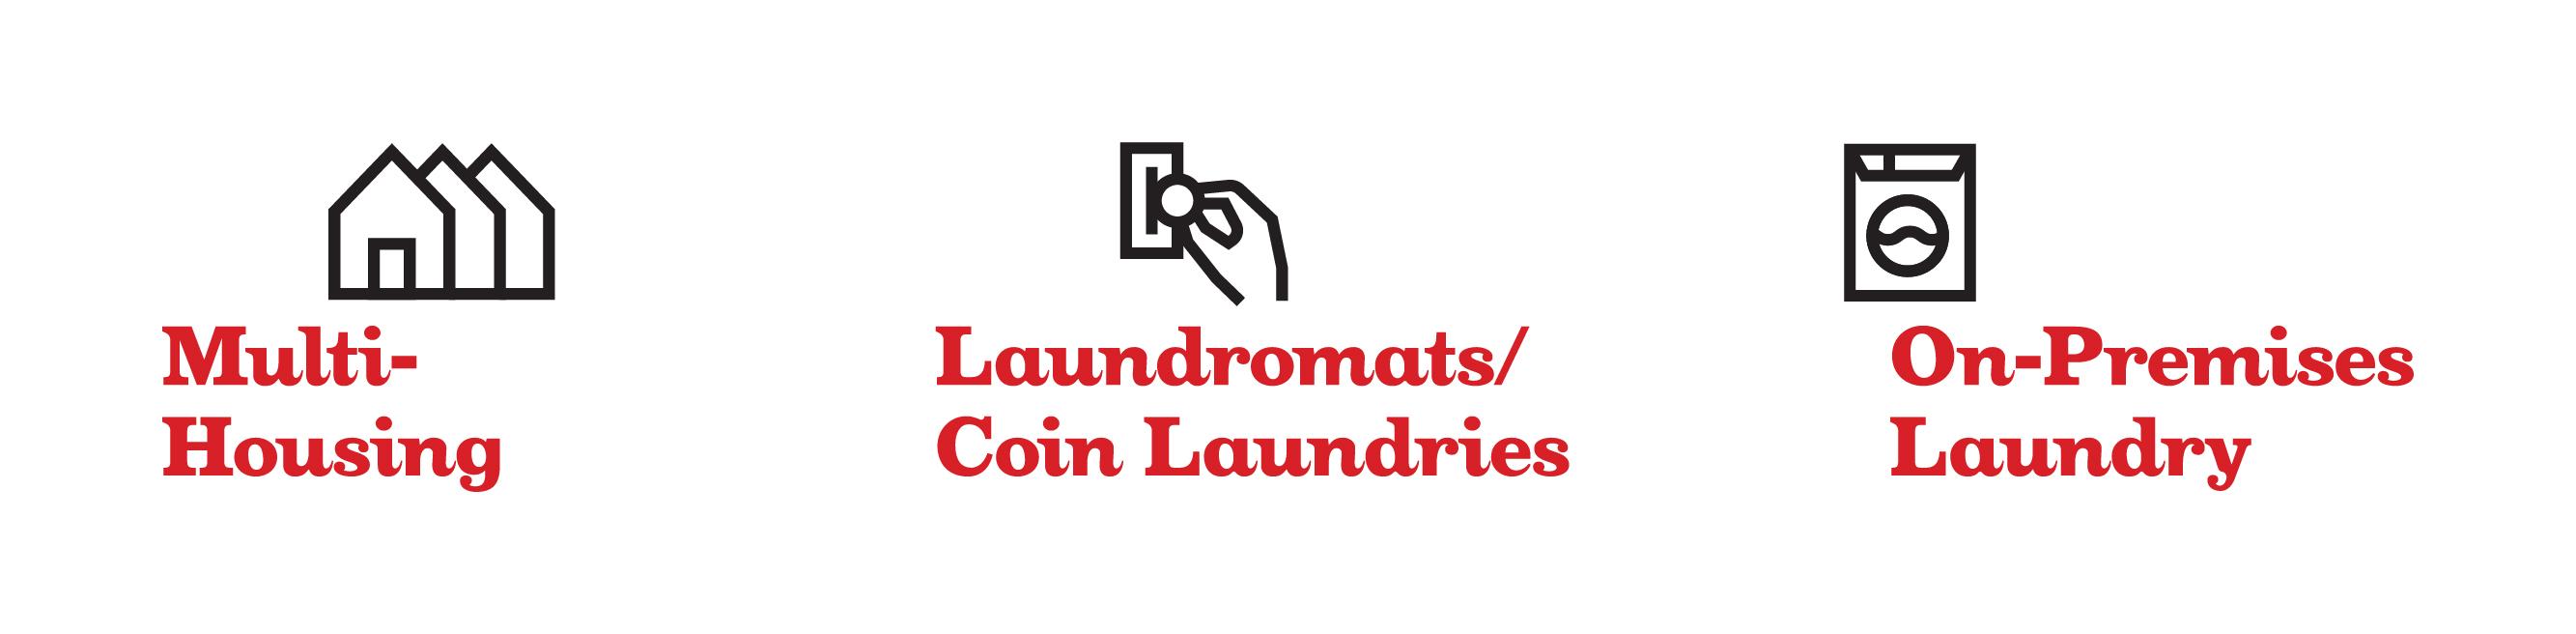 Multi-Housing, Laundromats/Coin Laundries, On-Premises Laundry